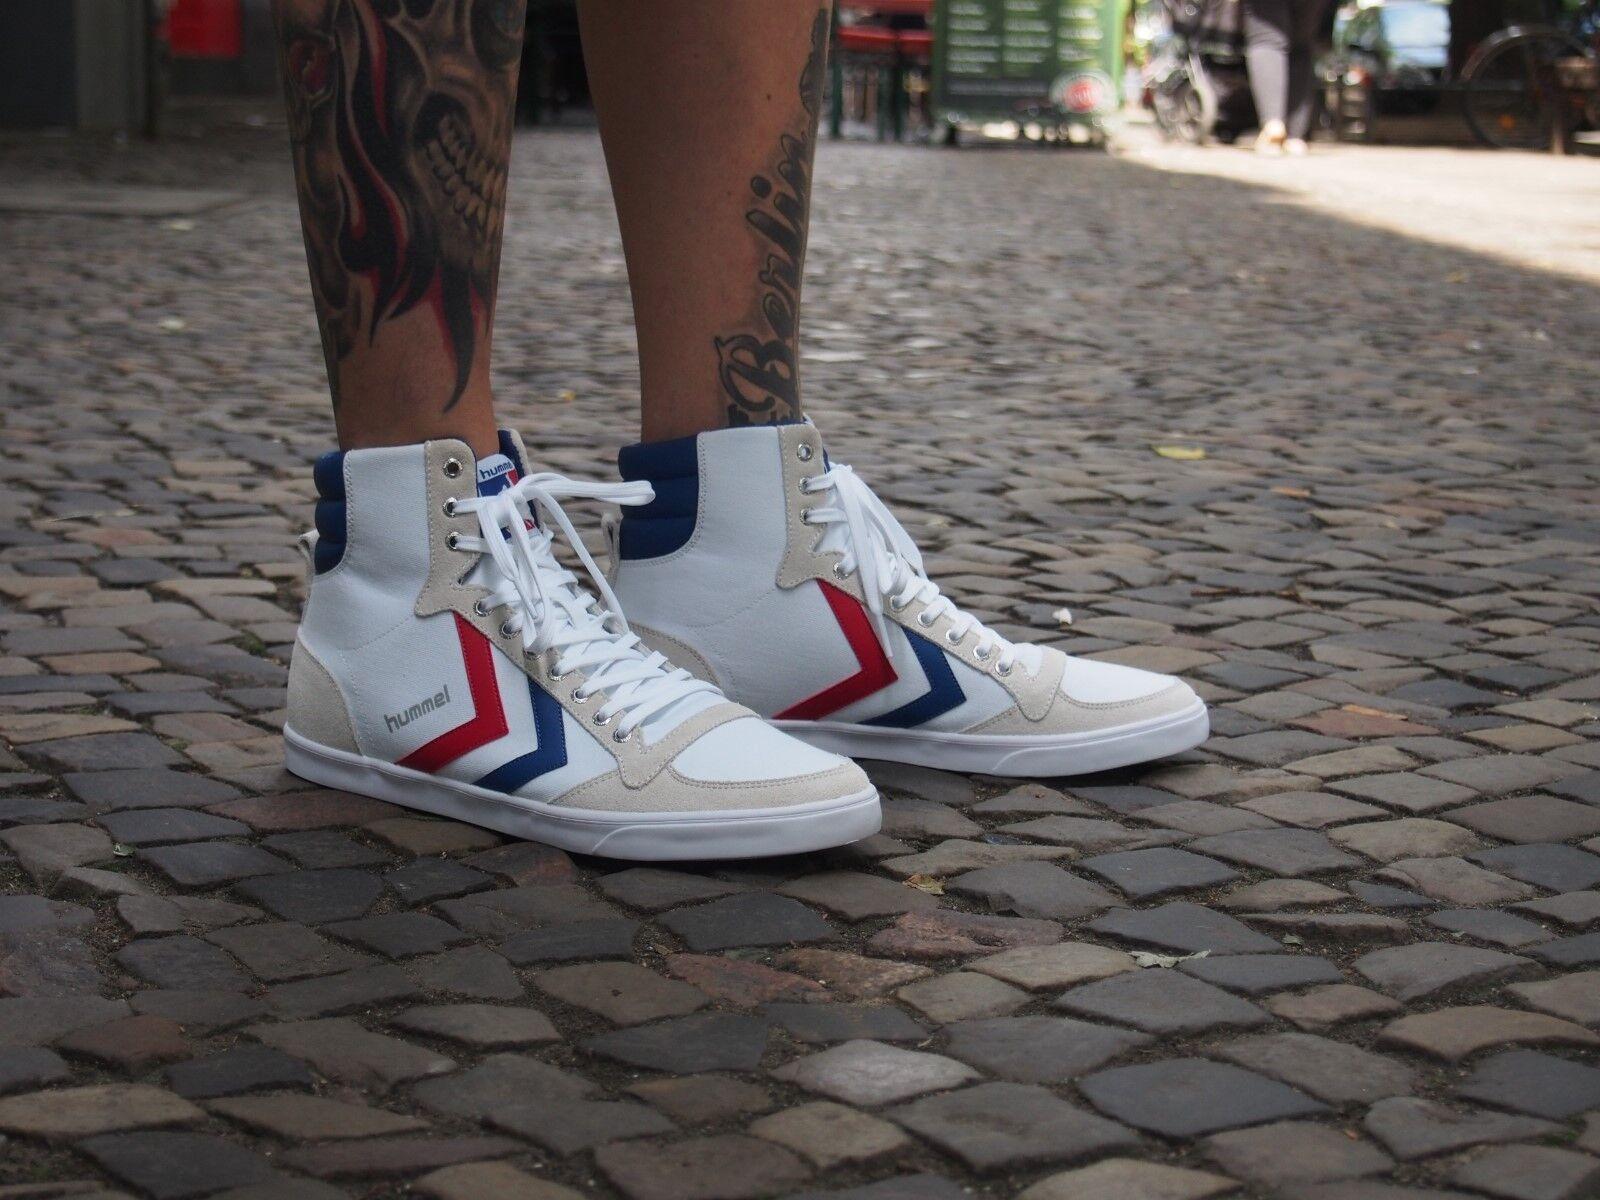 Hummel Schuhe SLIMMER STADIL High 63-511-9228 white/blue/red Canvas NEU Turschuh